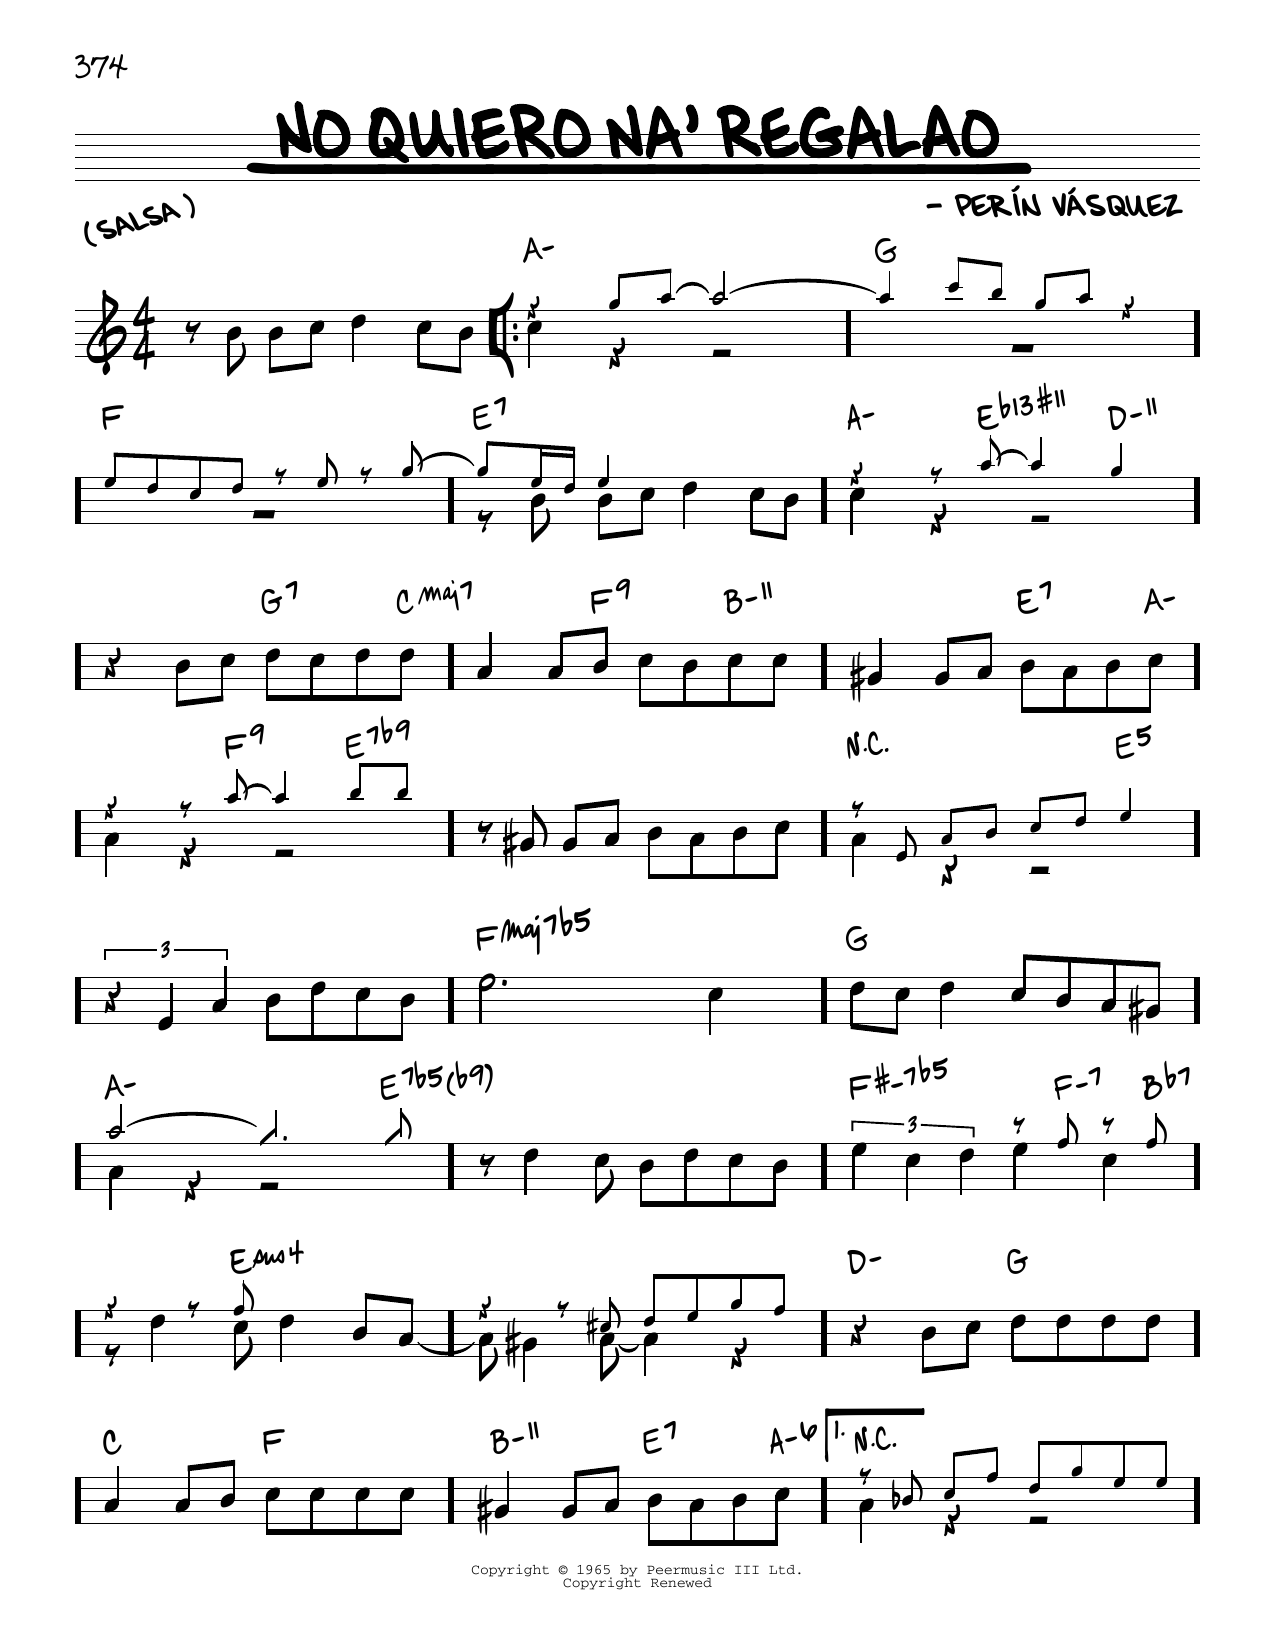 Perin Vasquez No Quiero Na' Regalao sheet music notes and chords. Download Printable PDF.